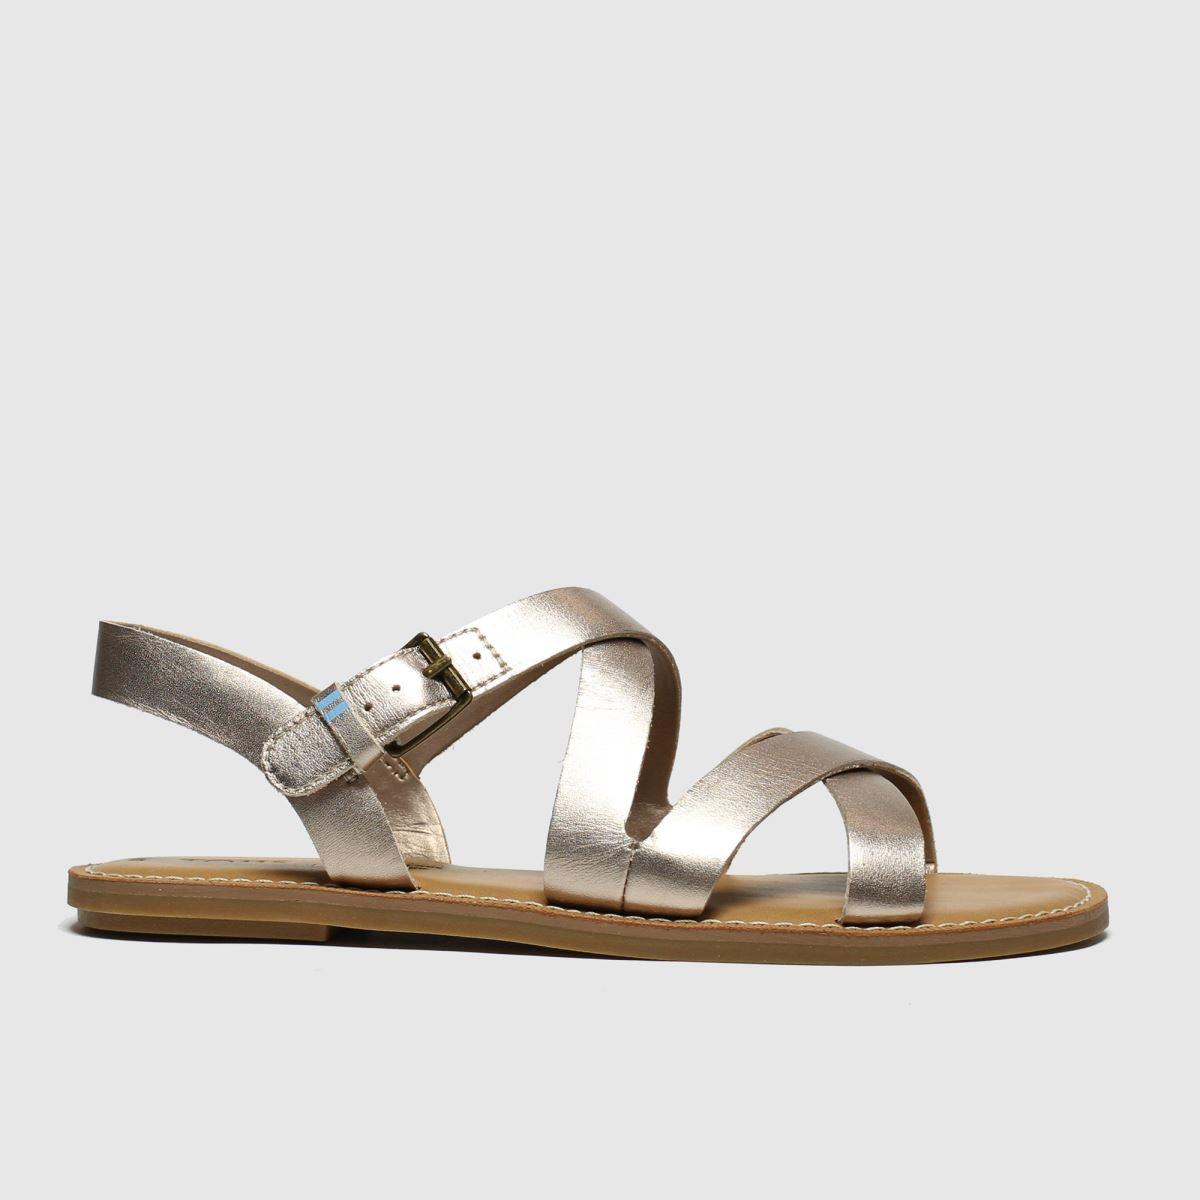 Toms Bronze Sicily Sandals